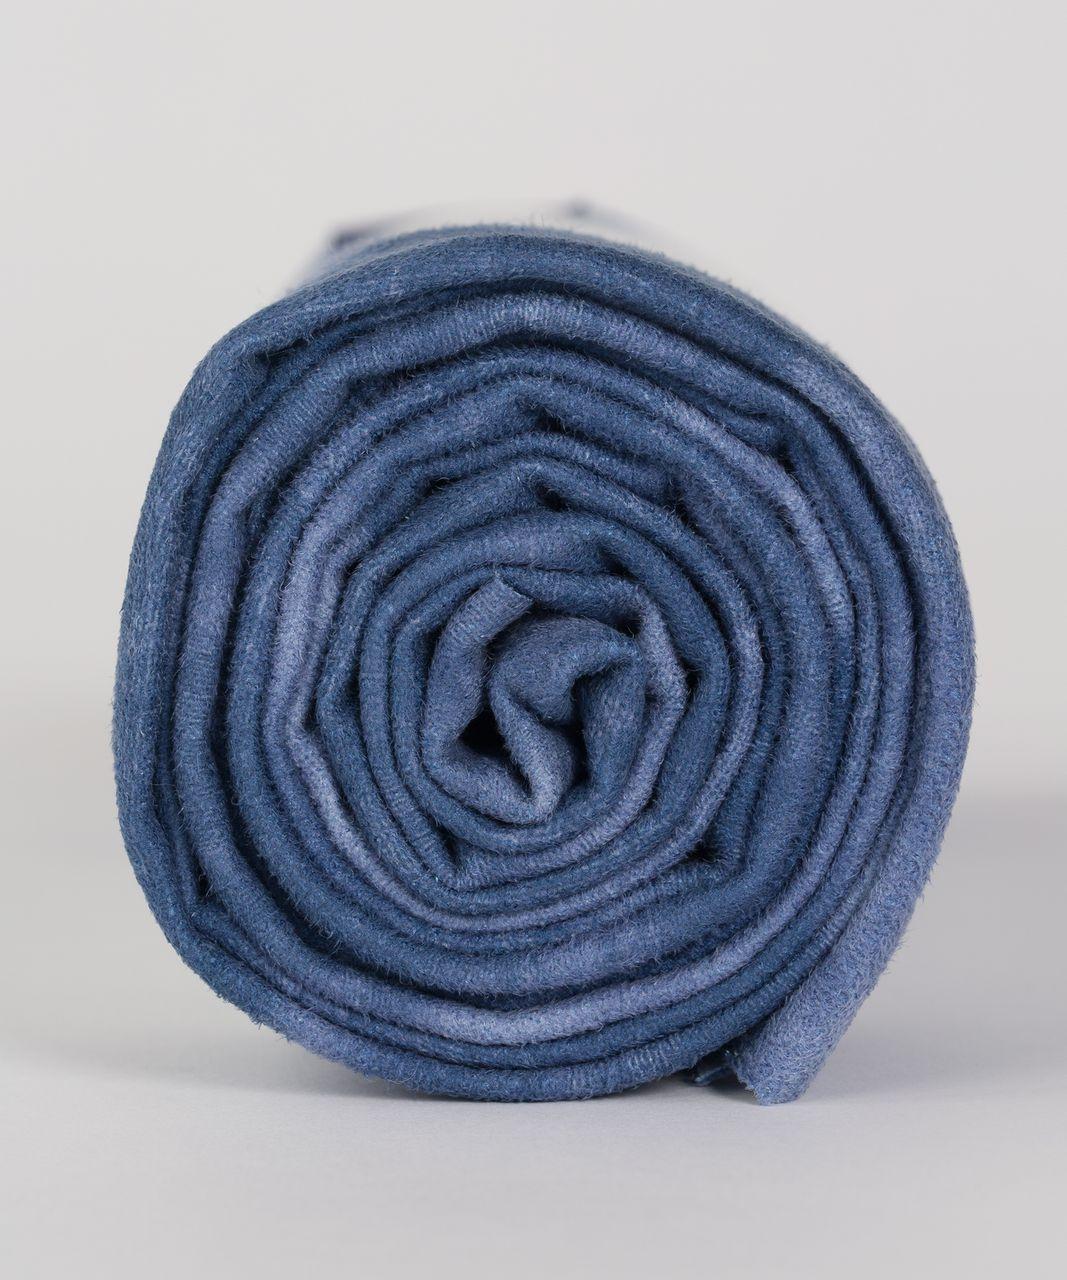 Lululemon The Towel - Tidal Trip Sailboat Blueberry Jam